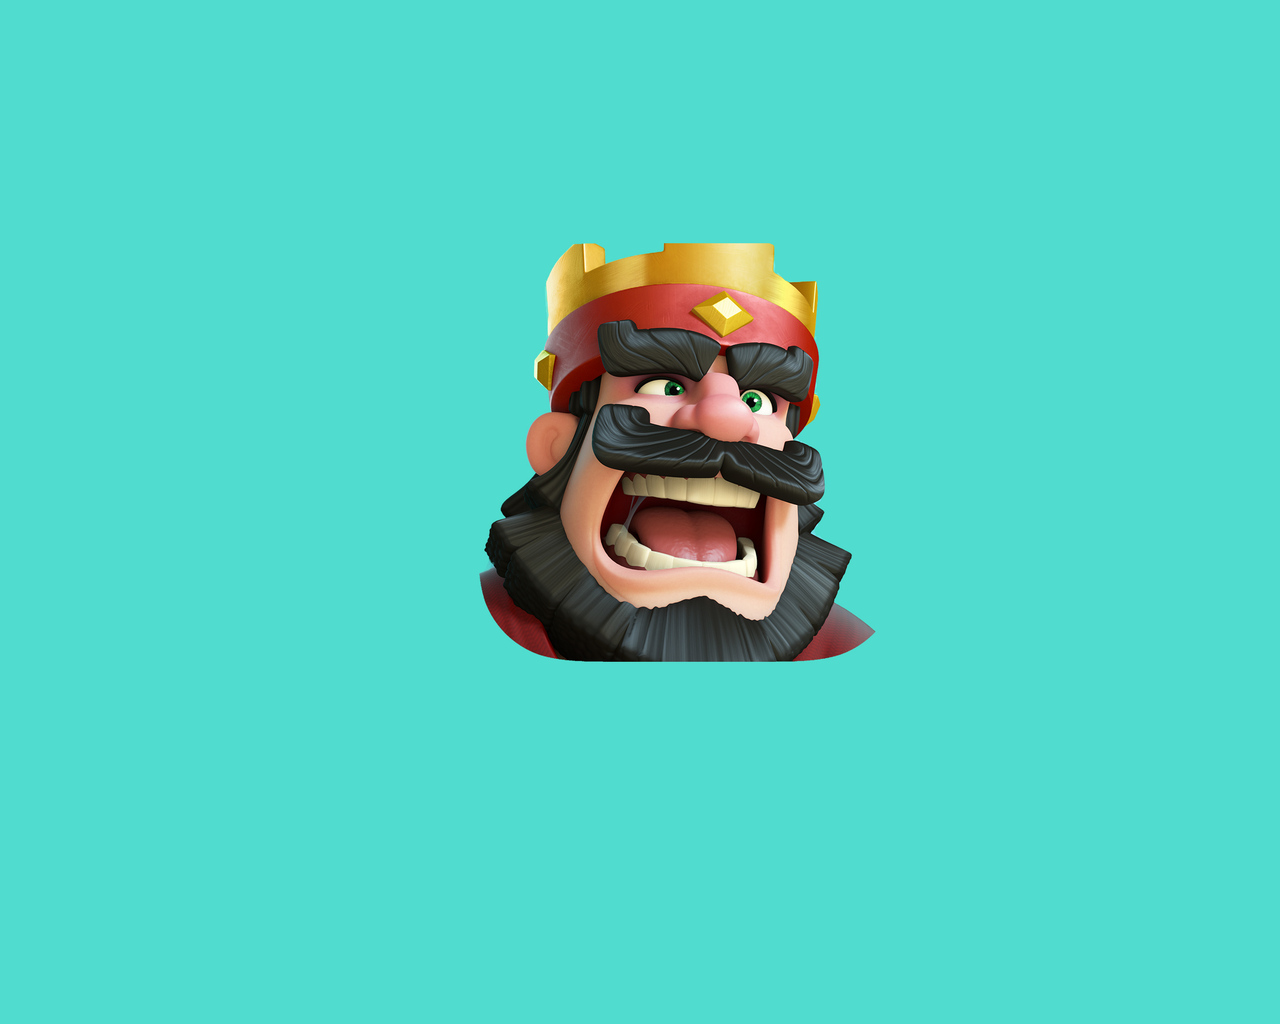 clash-royale-king-hd.jpg